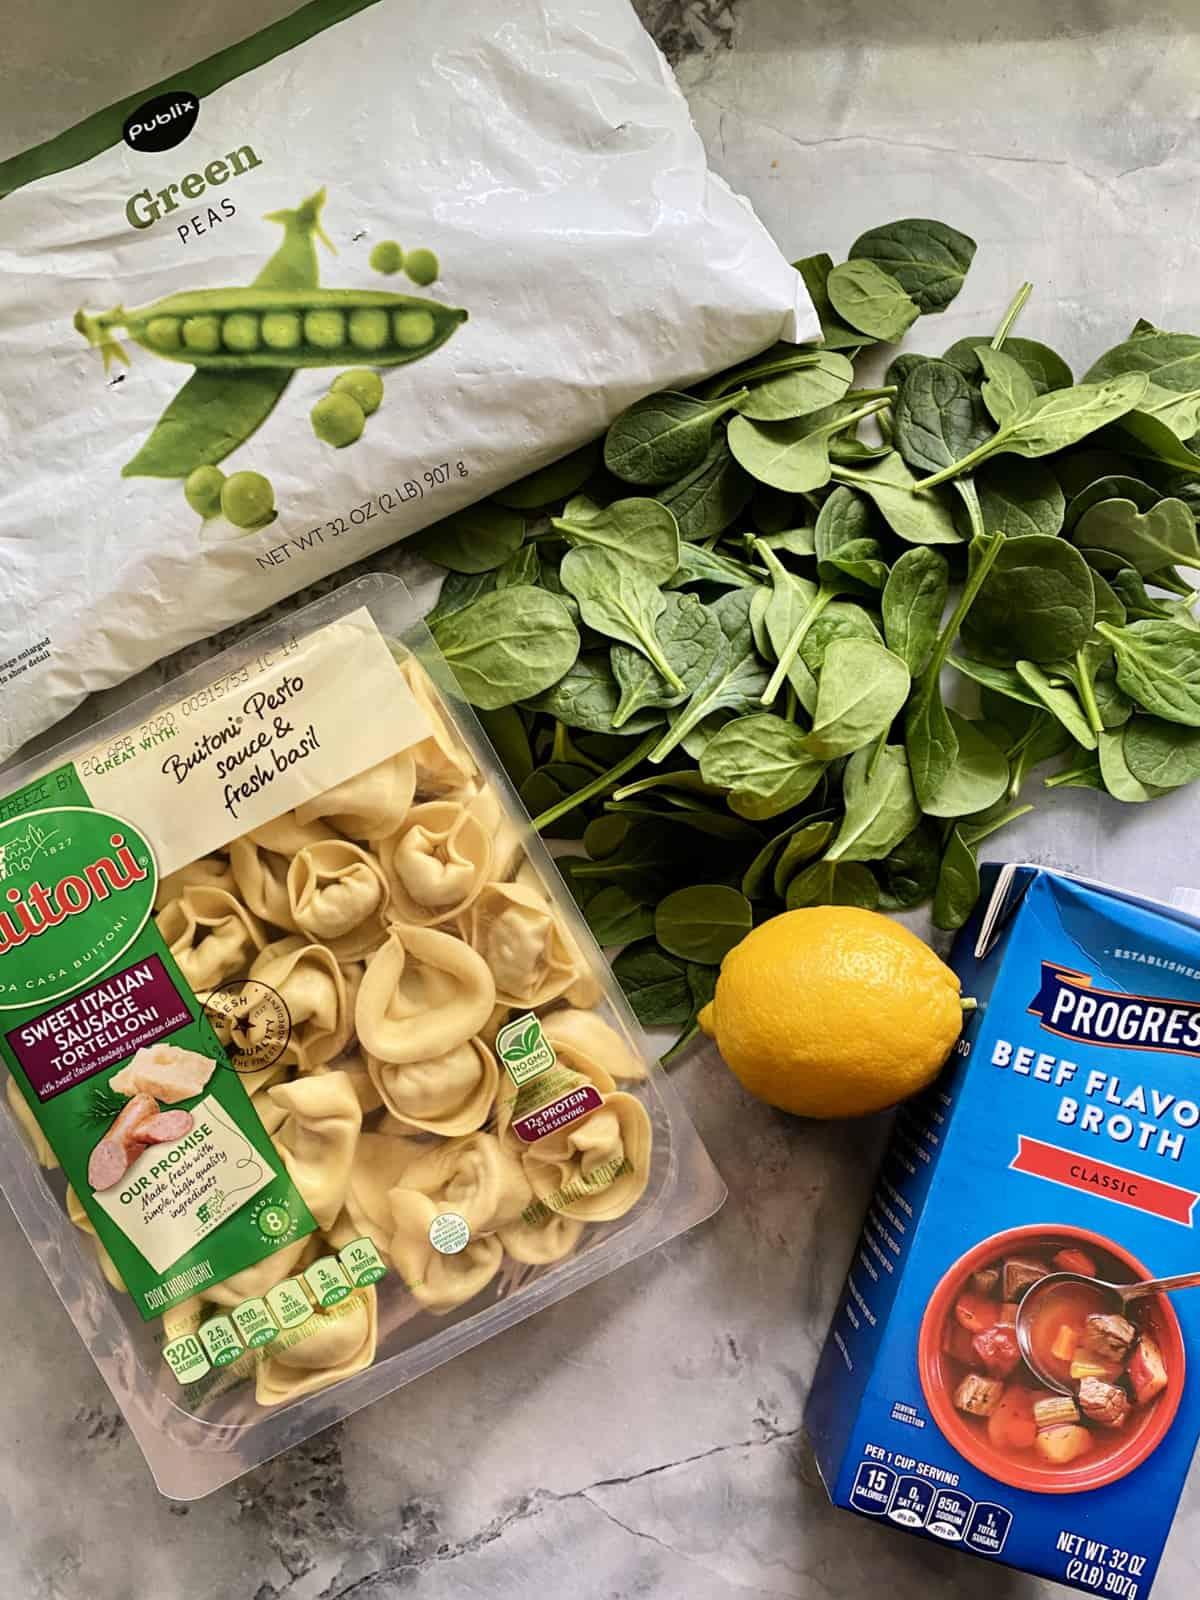 Ingredients: frozen peas, fresh spinach leaves, lemon, beef broth, sausage tortelloni